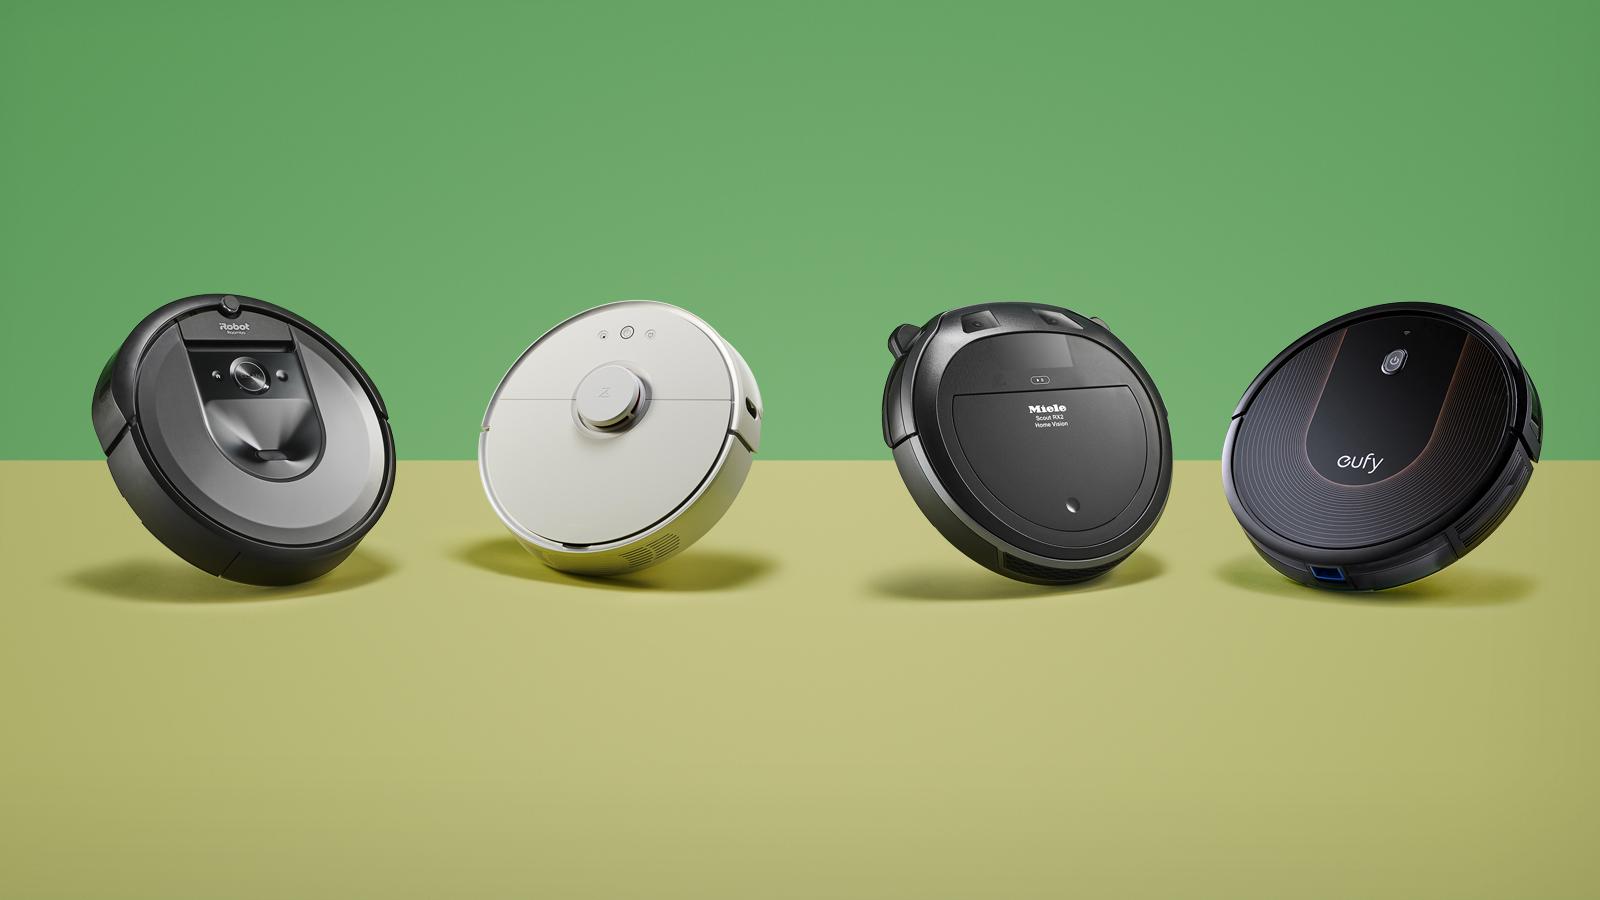 6 best robot vacuums 2020 | TechRadar